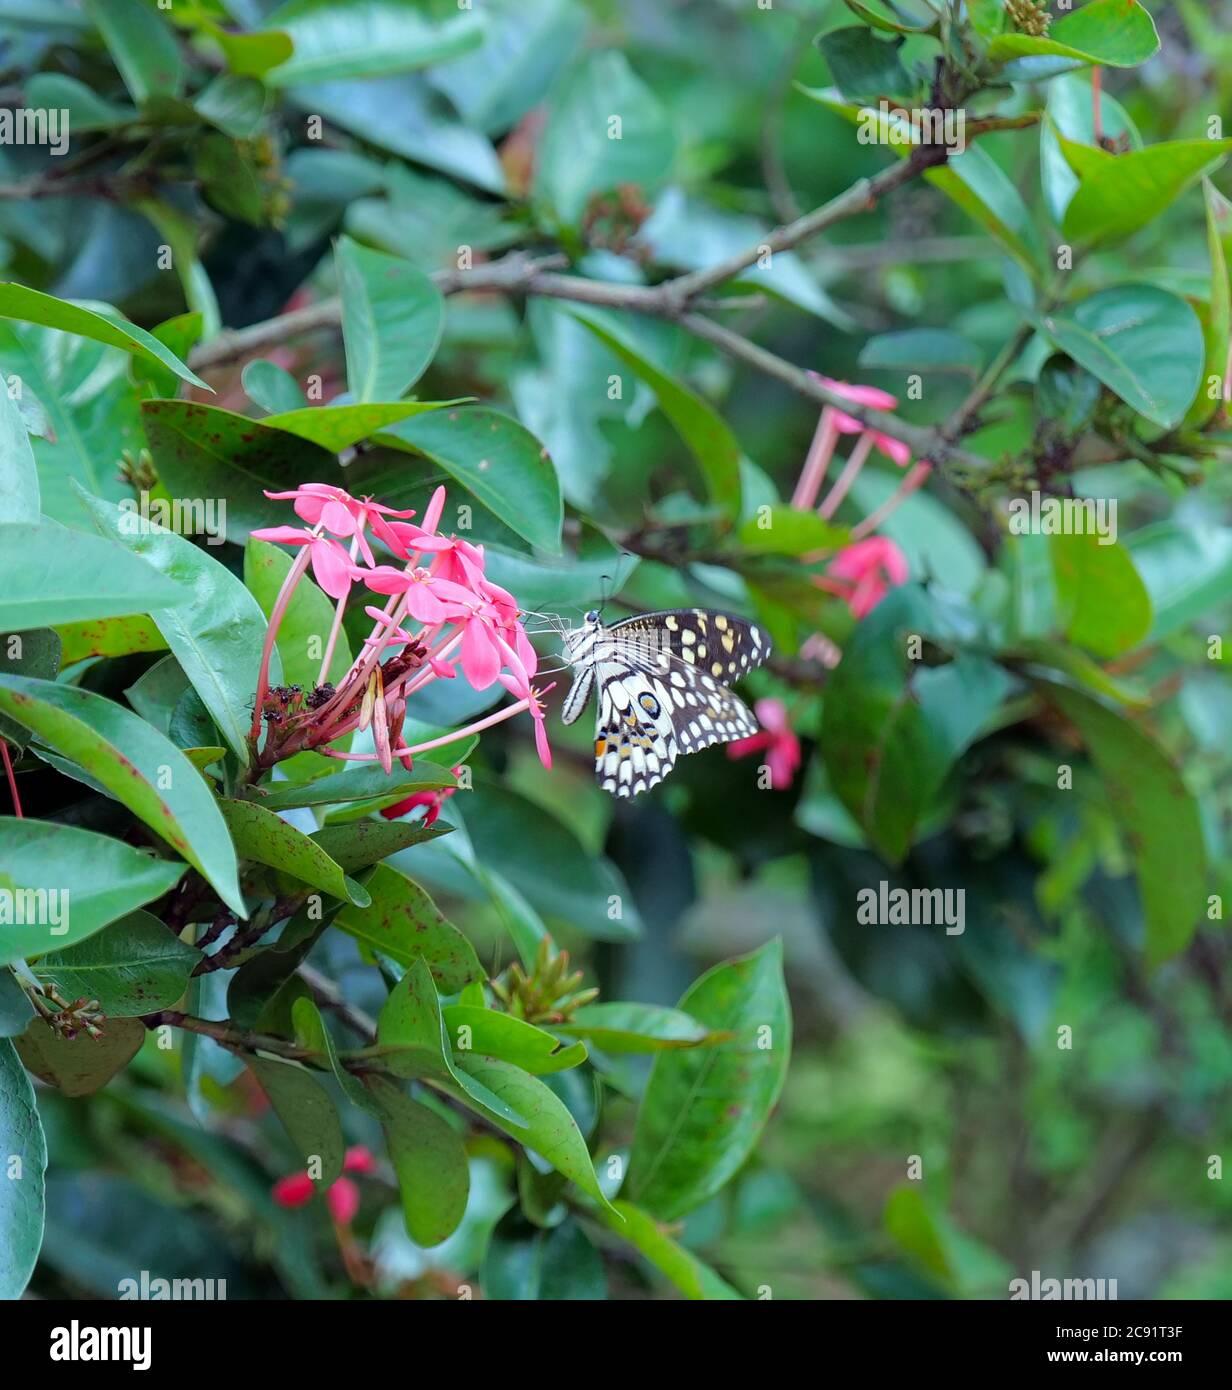 Mariposa marrón y blanca recoger néctar de la flor rosa Ixora, Kerala, India. Foto de stock